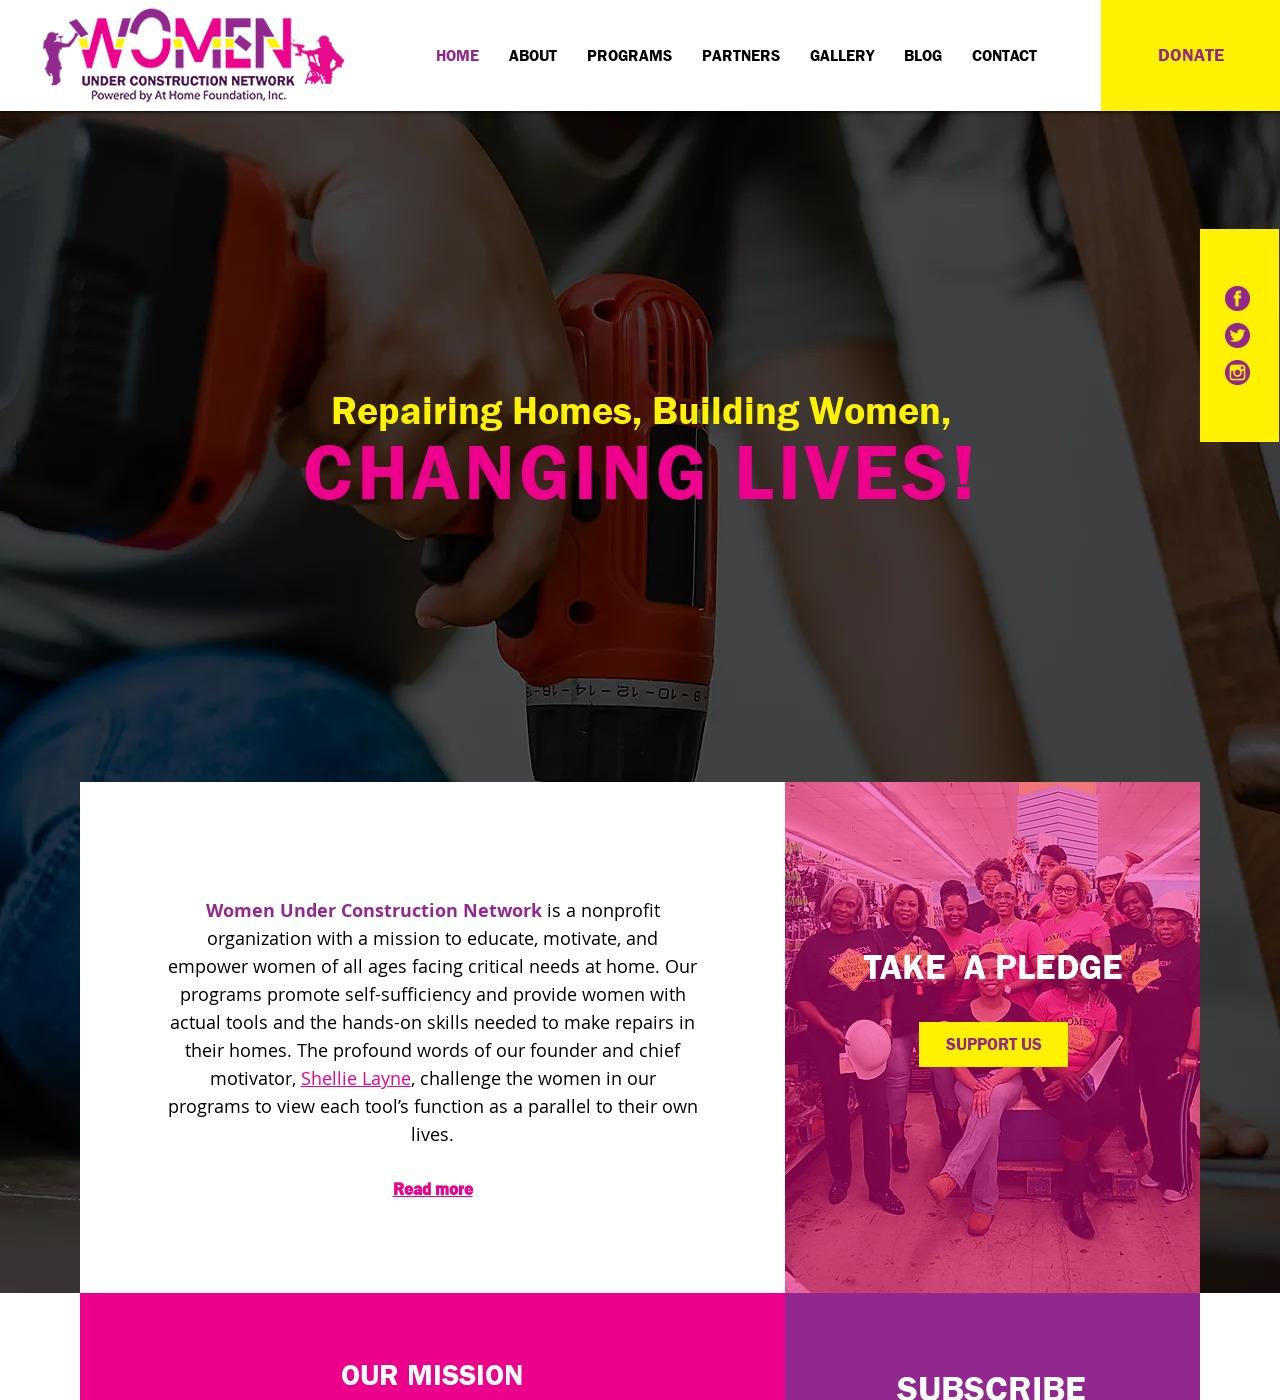 WUC Network - Website Design - C Kinion Design